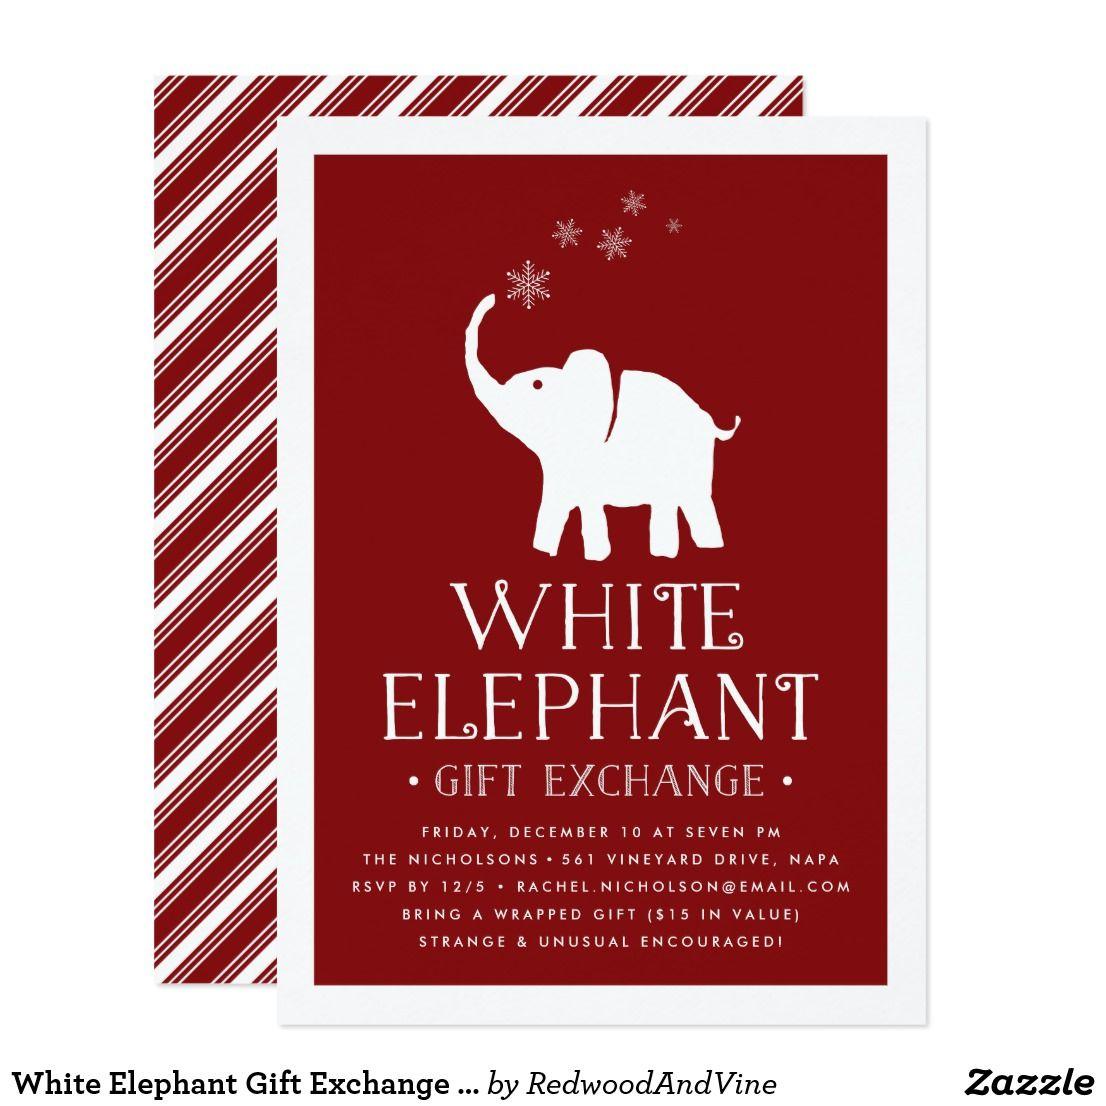 White Elephant Gift Exchange Party Invitation   Zazzle.com   White ...